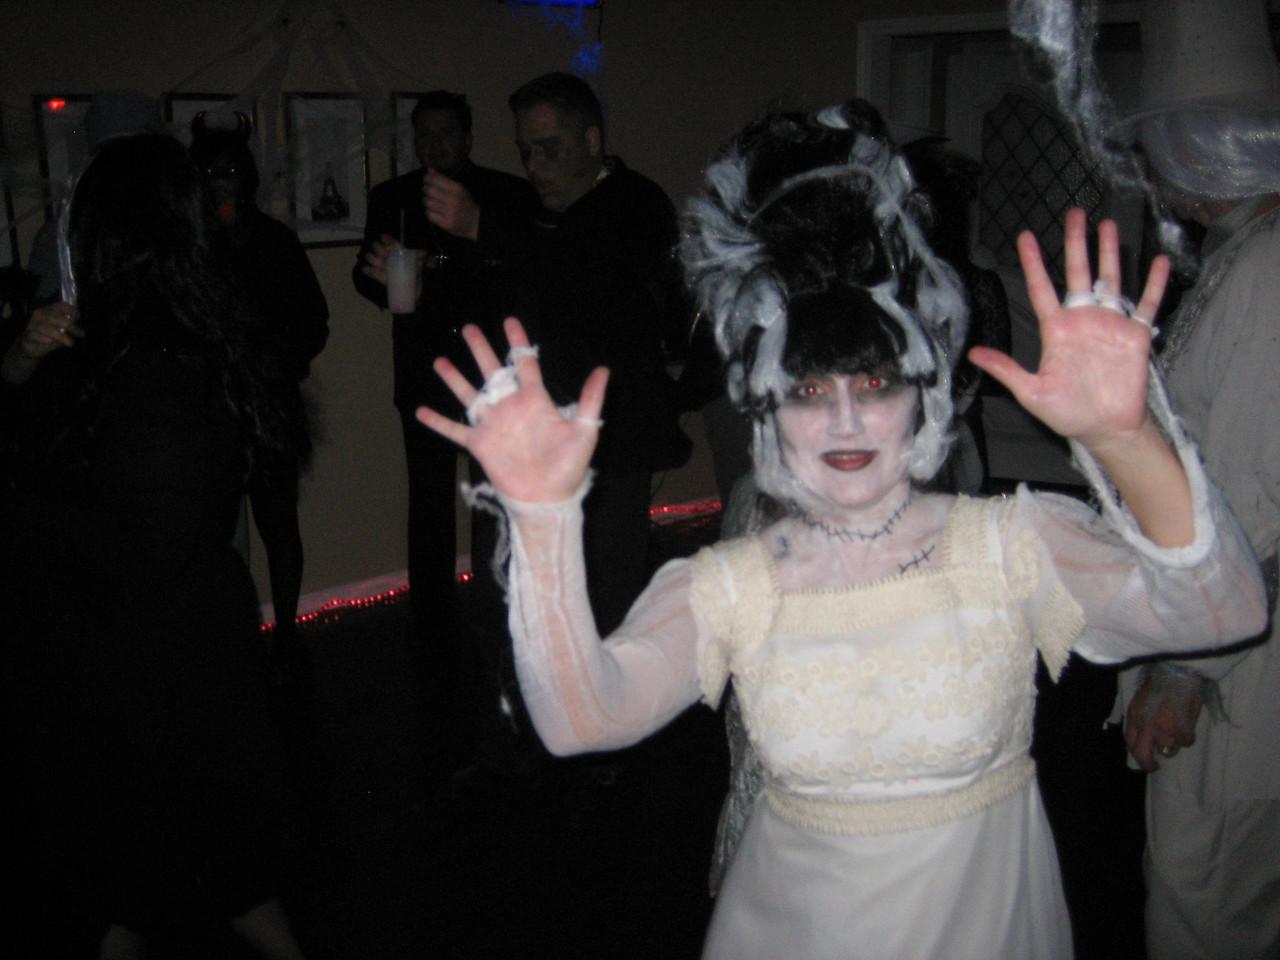 bride of Frankenstein (MeLinda)